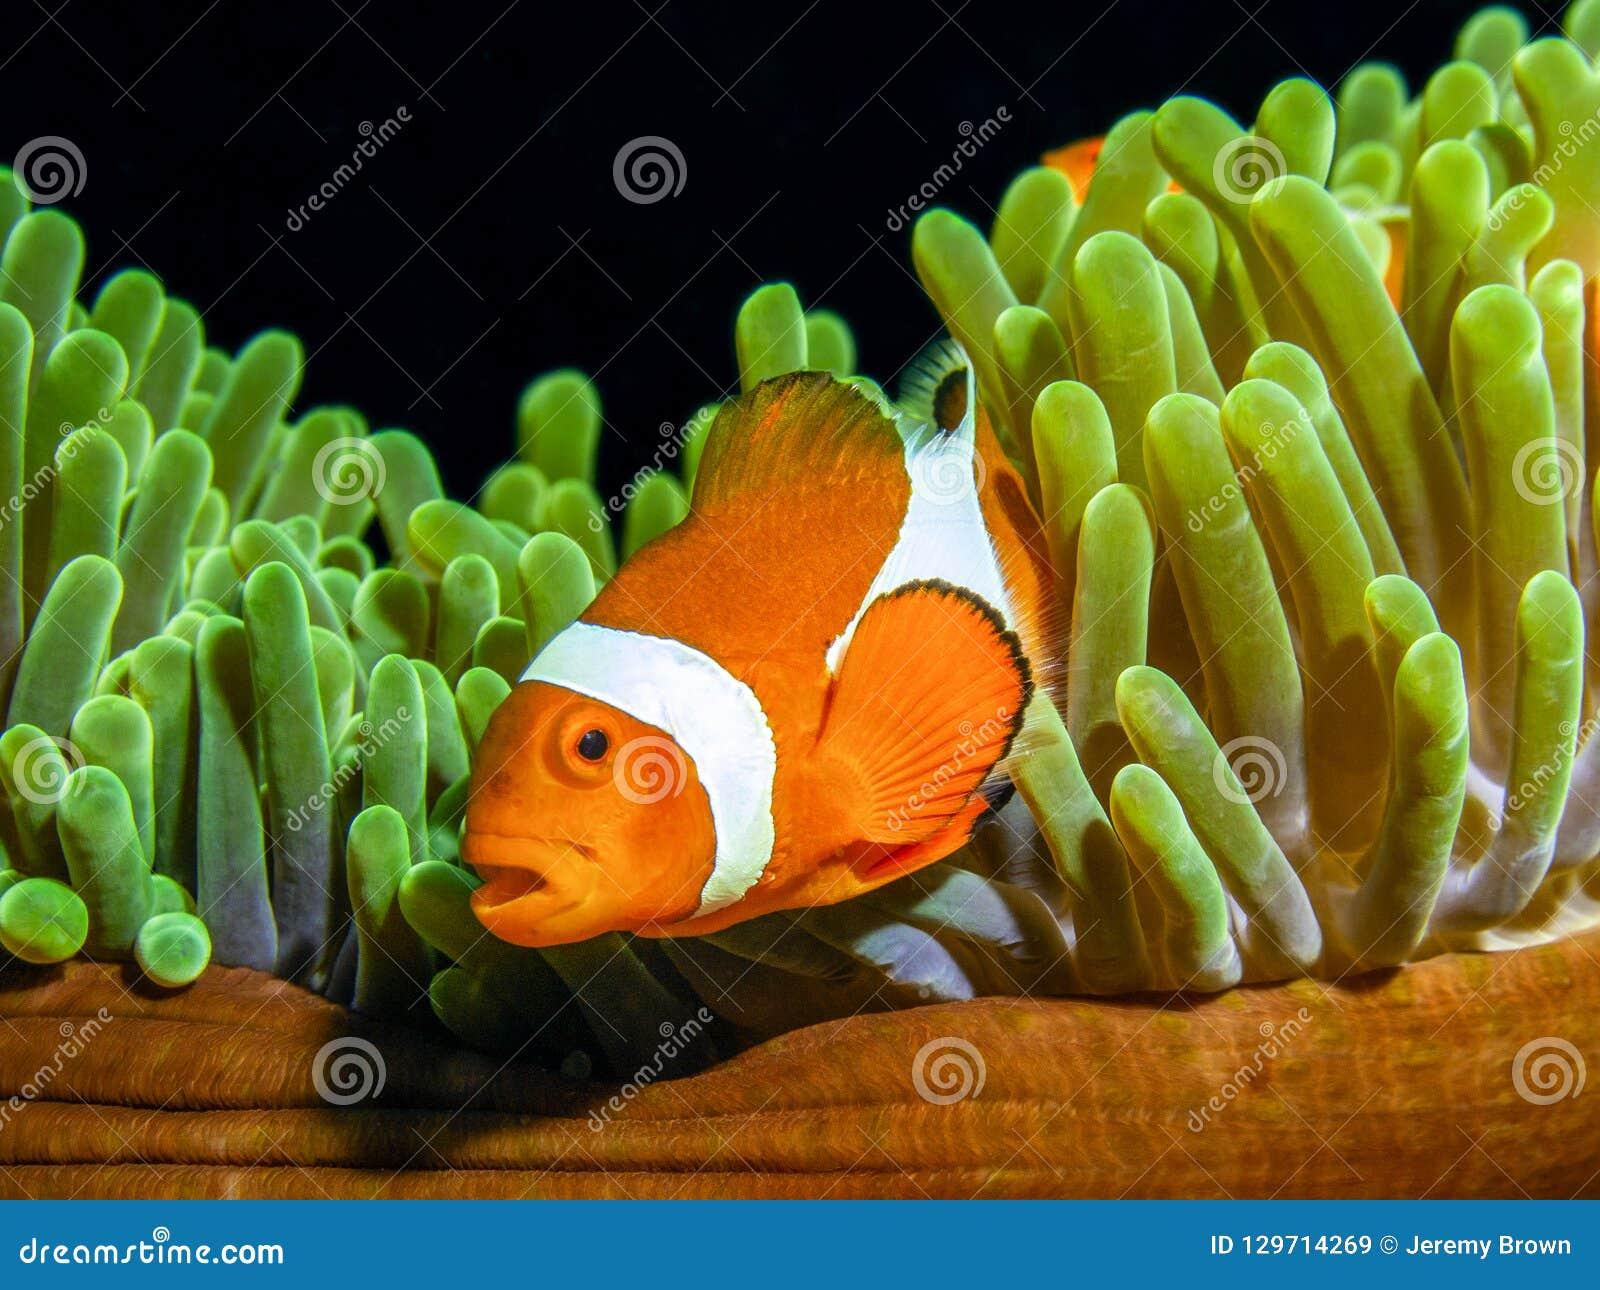 Clown fish of Nemo fame, Ocellaris clownfish